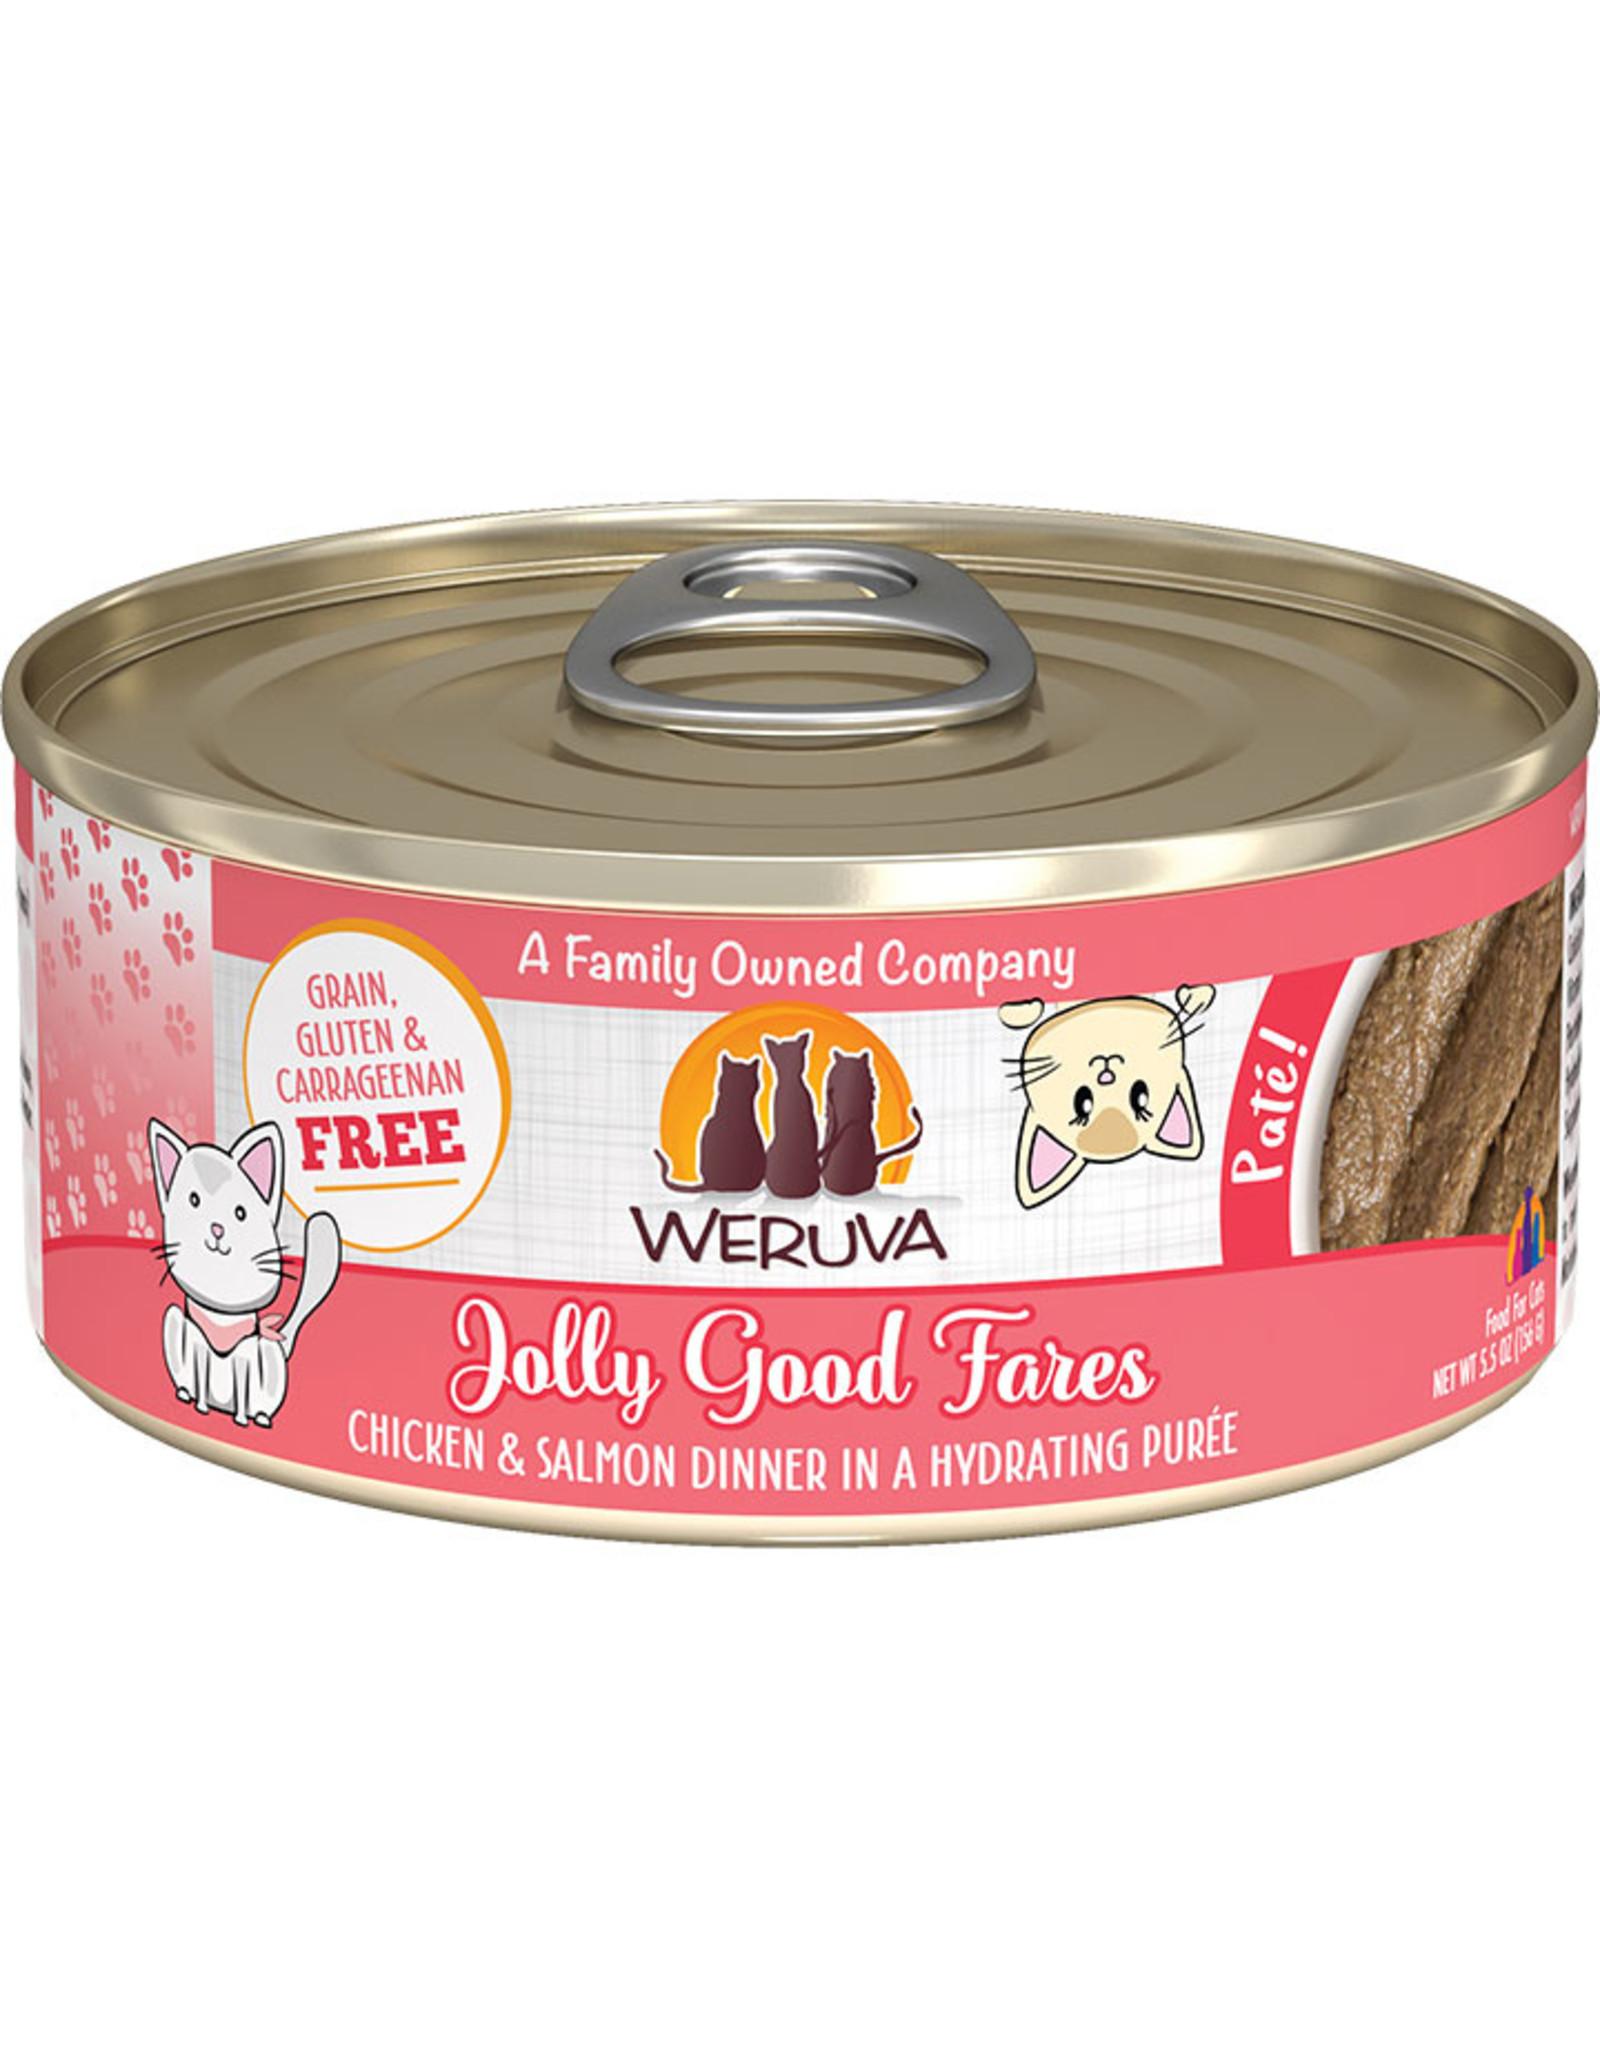 Weruva Weruva Jolly Good Fares Chicken & Salmon Dinner Pate Cat Food 5.5oz